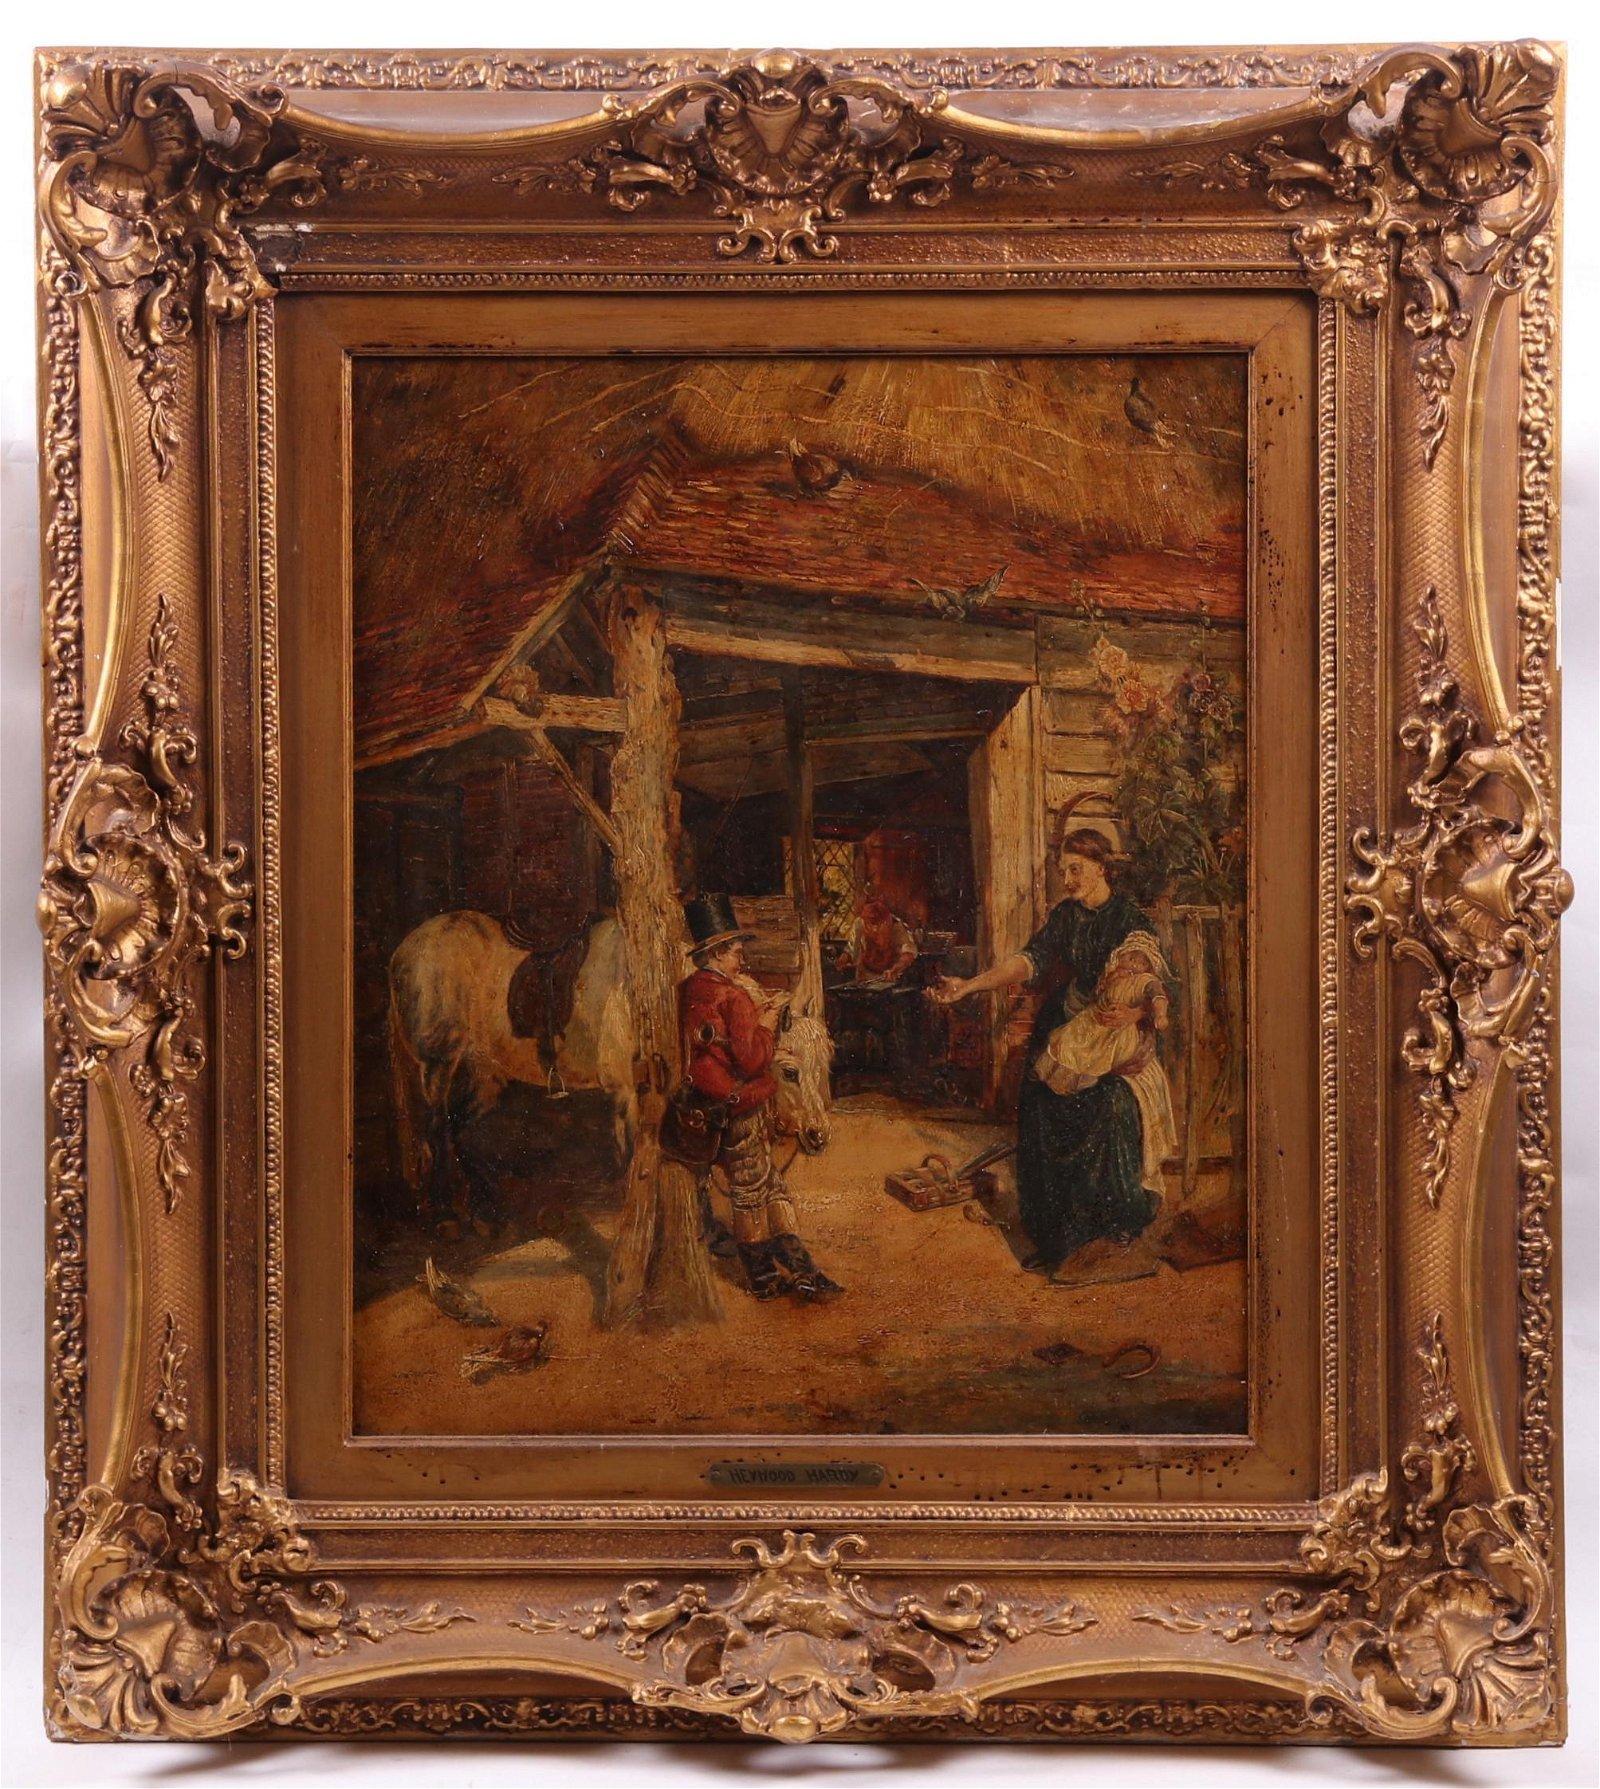 Att: Heywood Hardy (British 1843-1933) Oil on Canvas